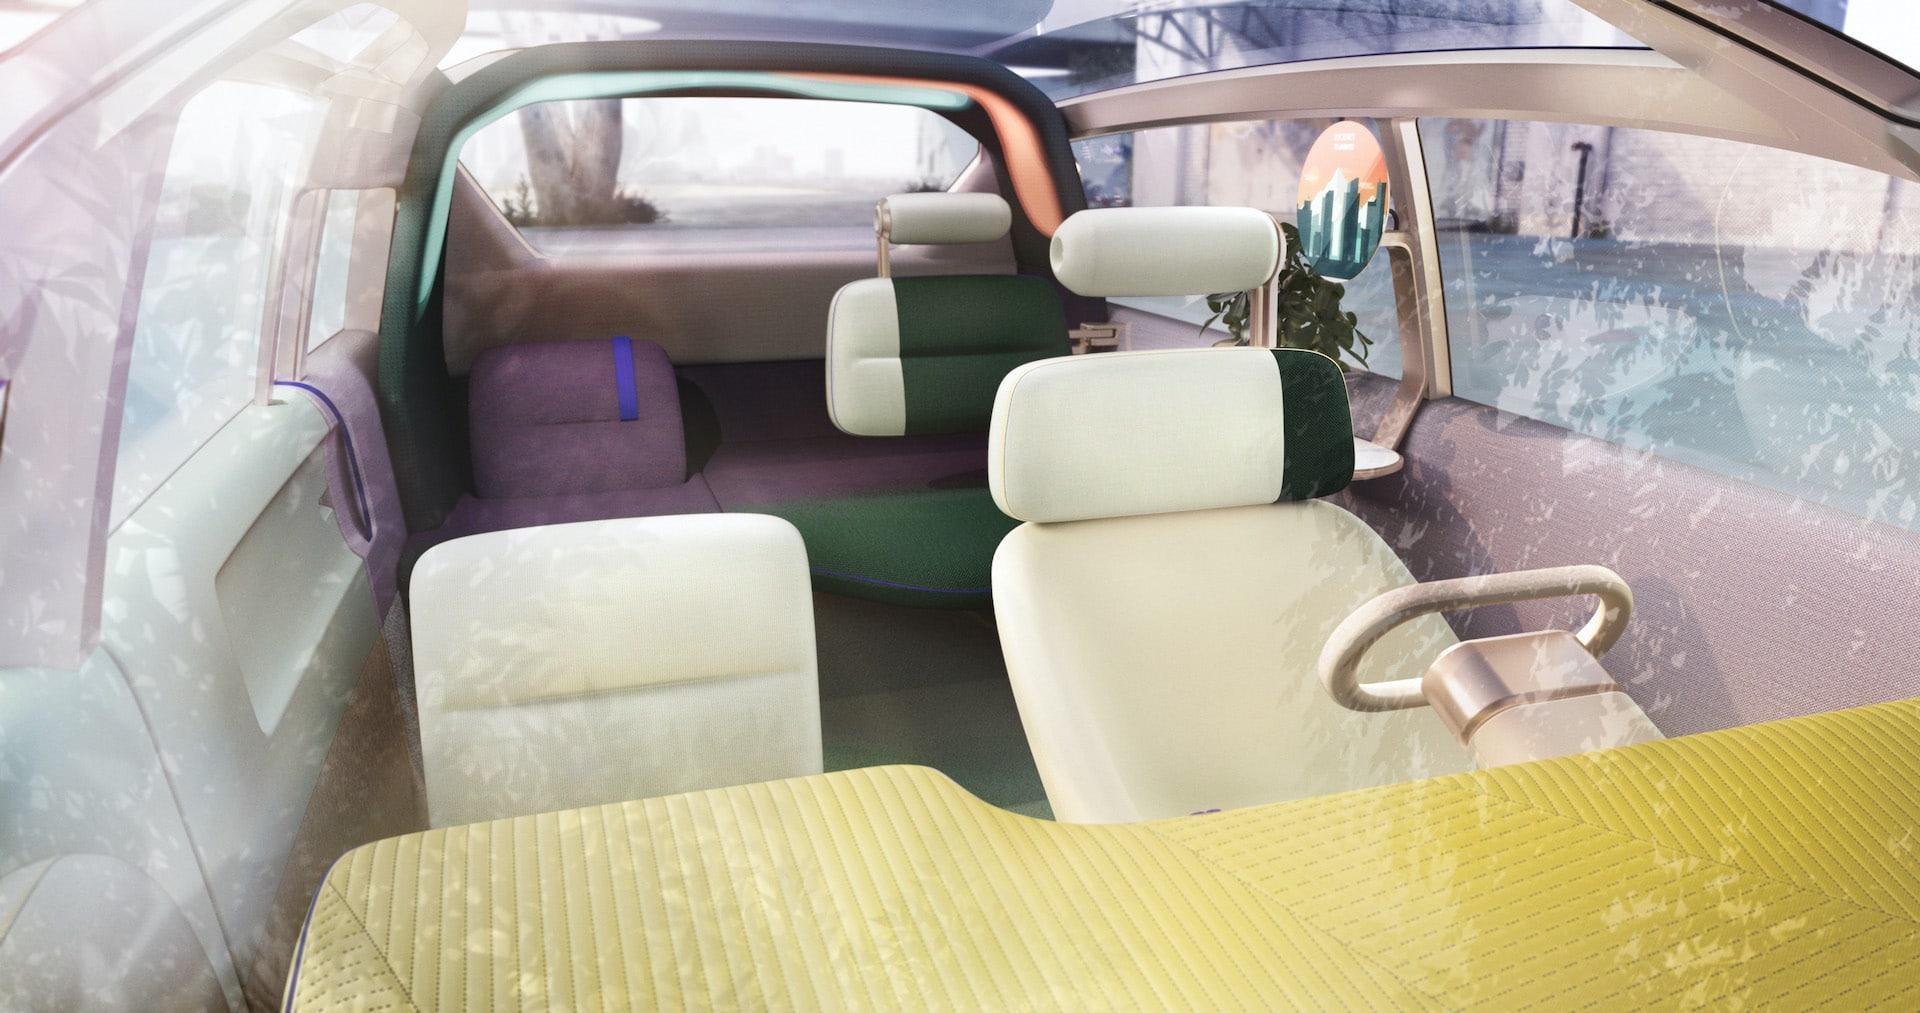 BMW-MINI-Elektroauto-Zukunft-Vision-Urbanaut-Fahrer